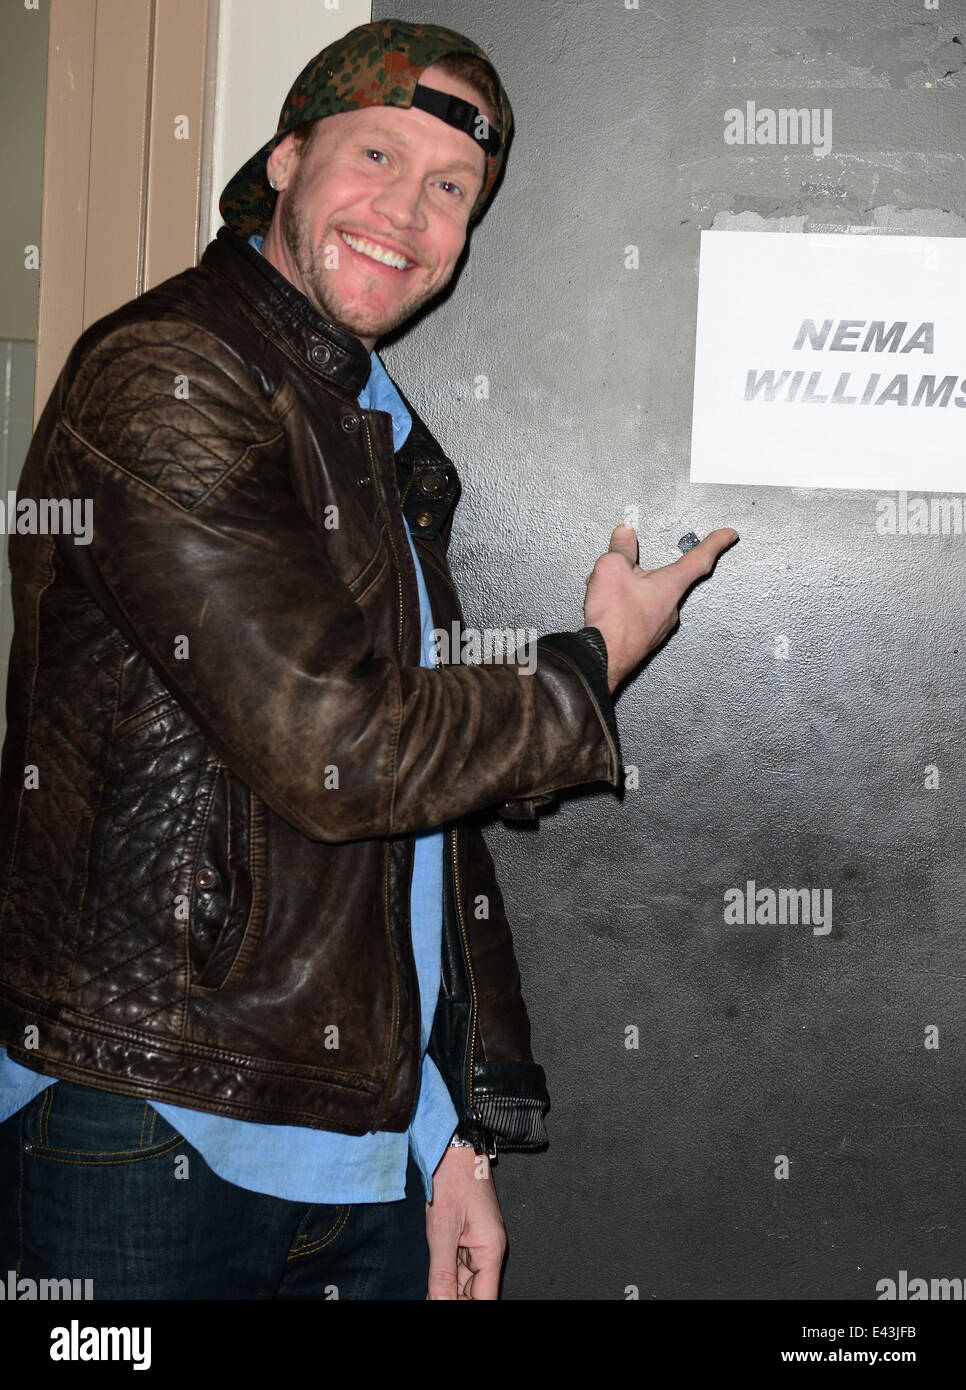 Katt Williams Growth Spurt comedy tour at the James L Knight Center  Featuring: Nema Williams Where: Miami, Florida, - Stock Image